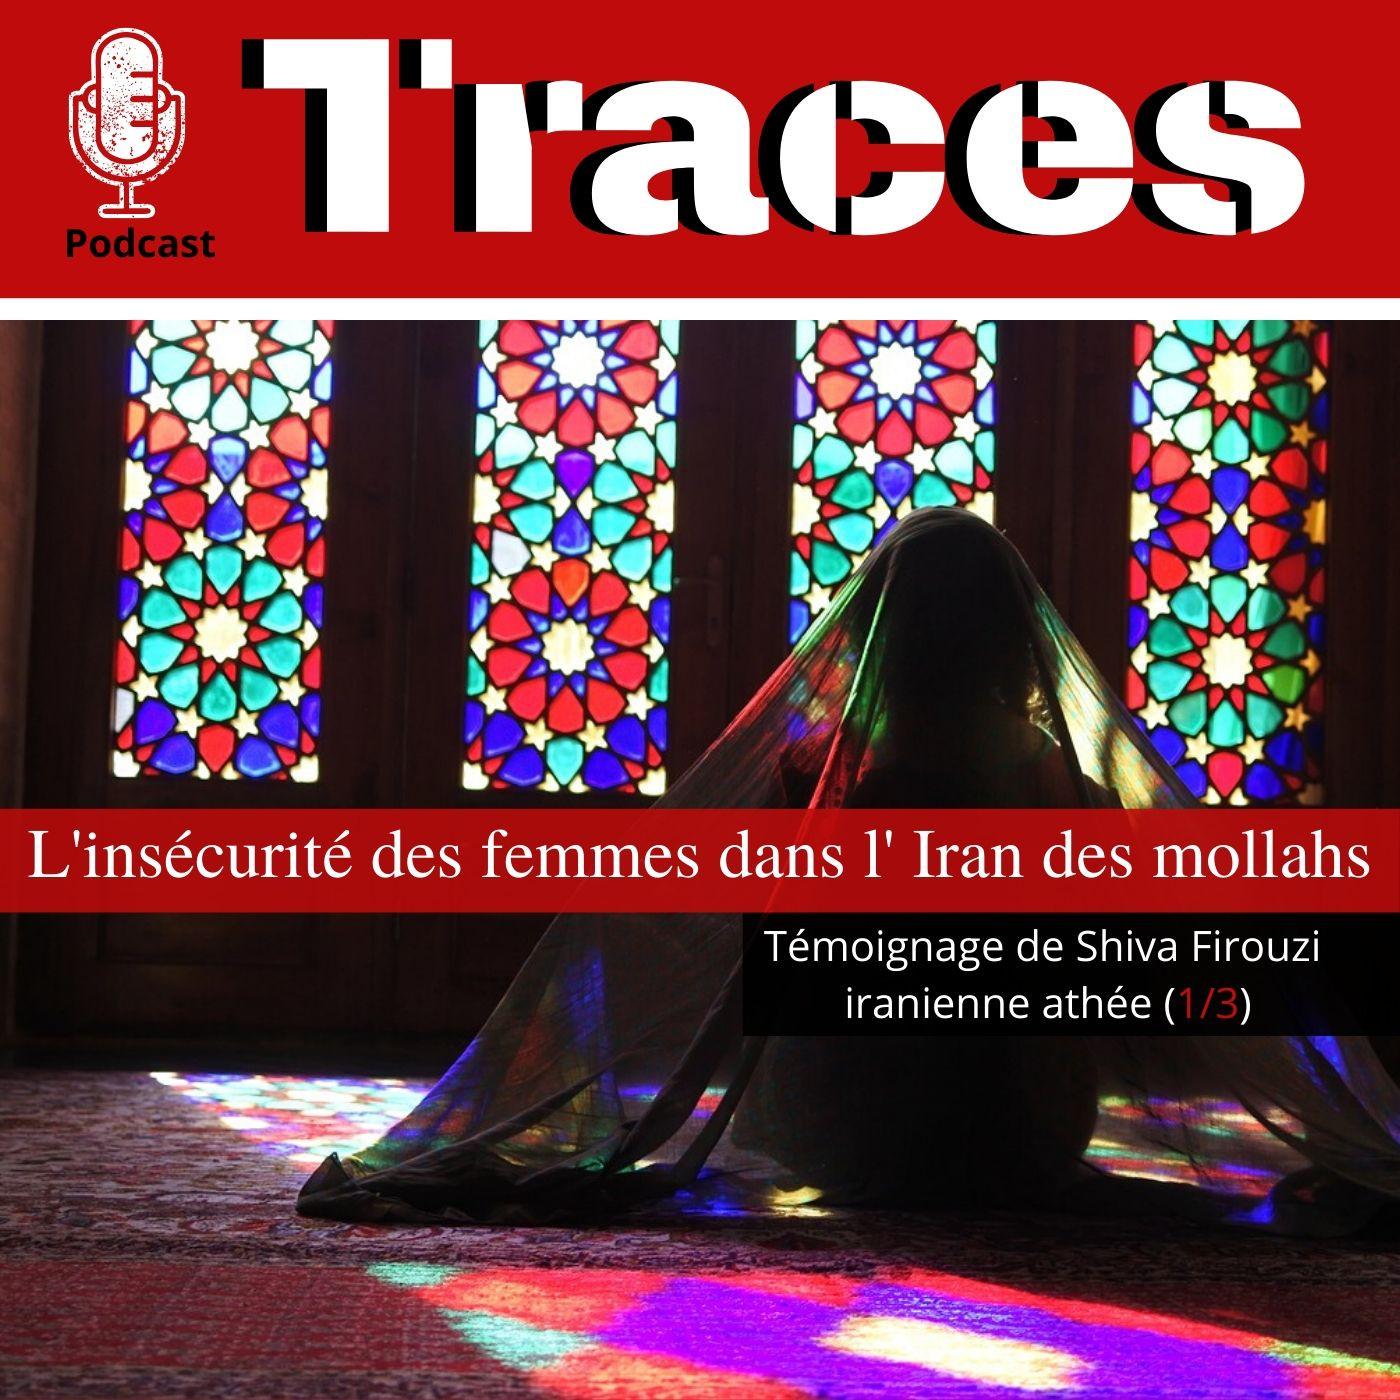 Shiva Firouzi, témoignage d'une iranienne athée (1/3)